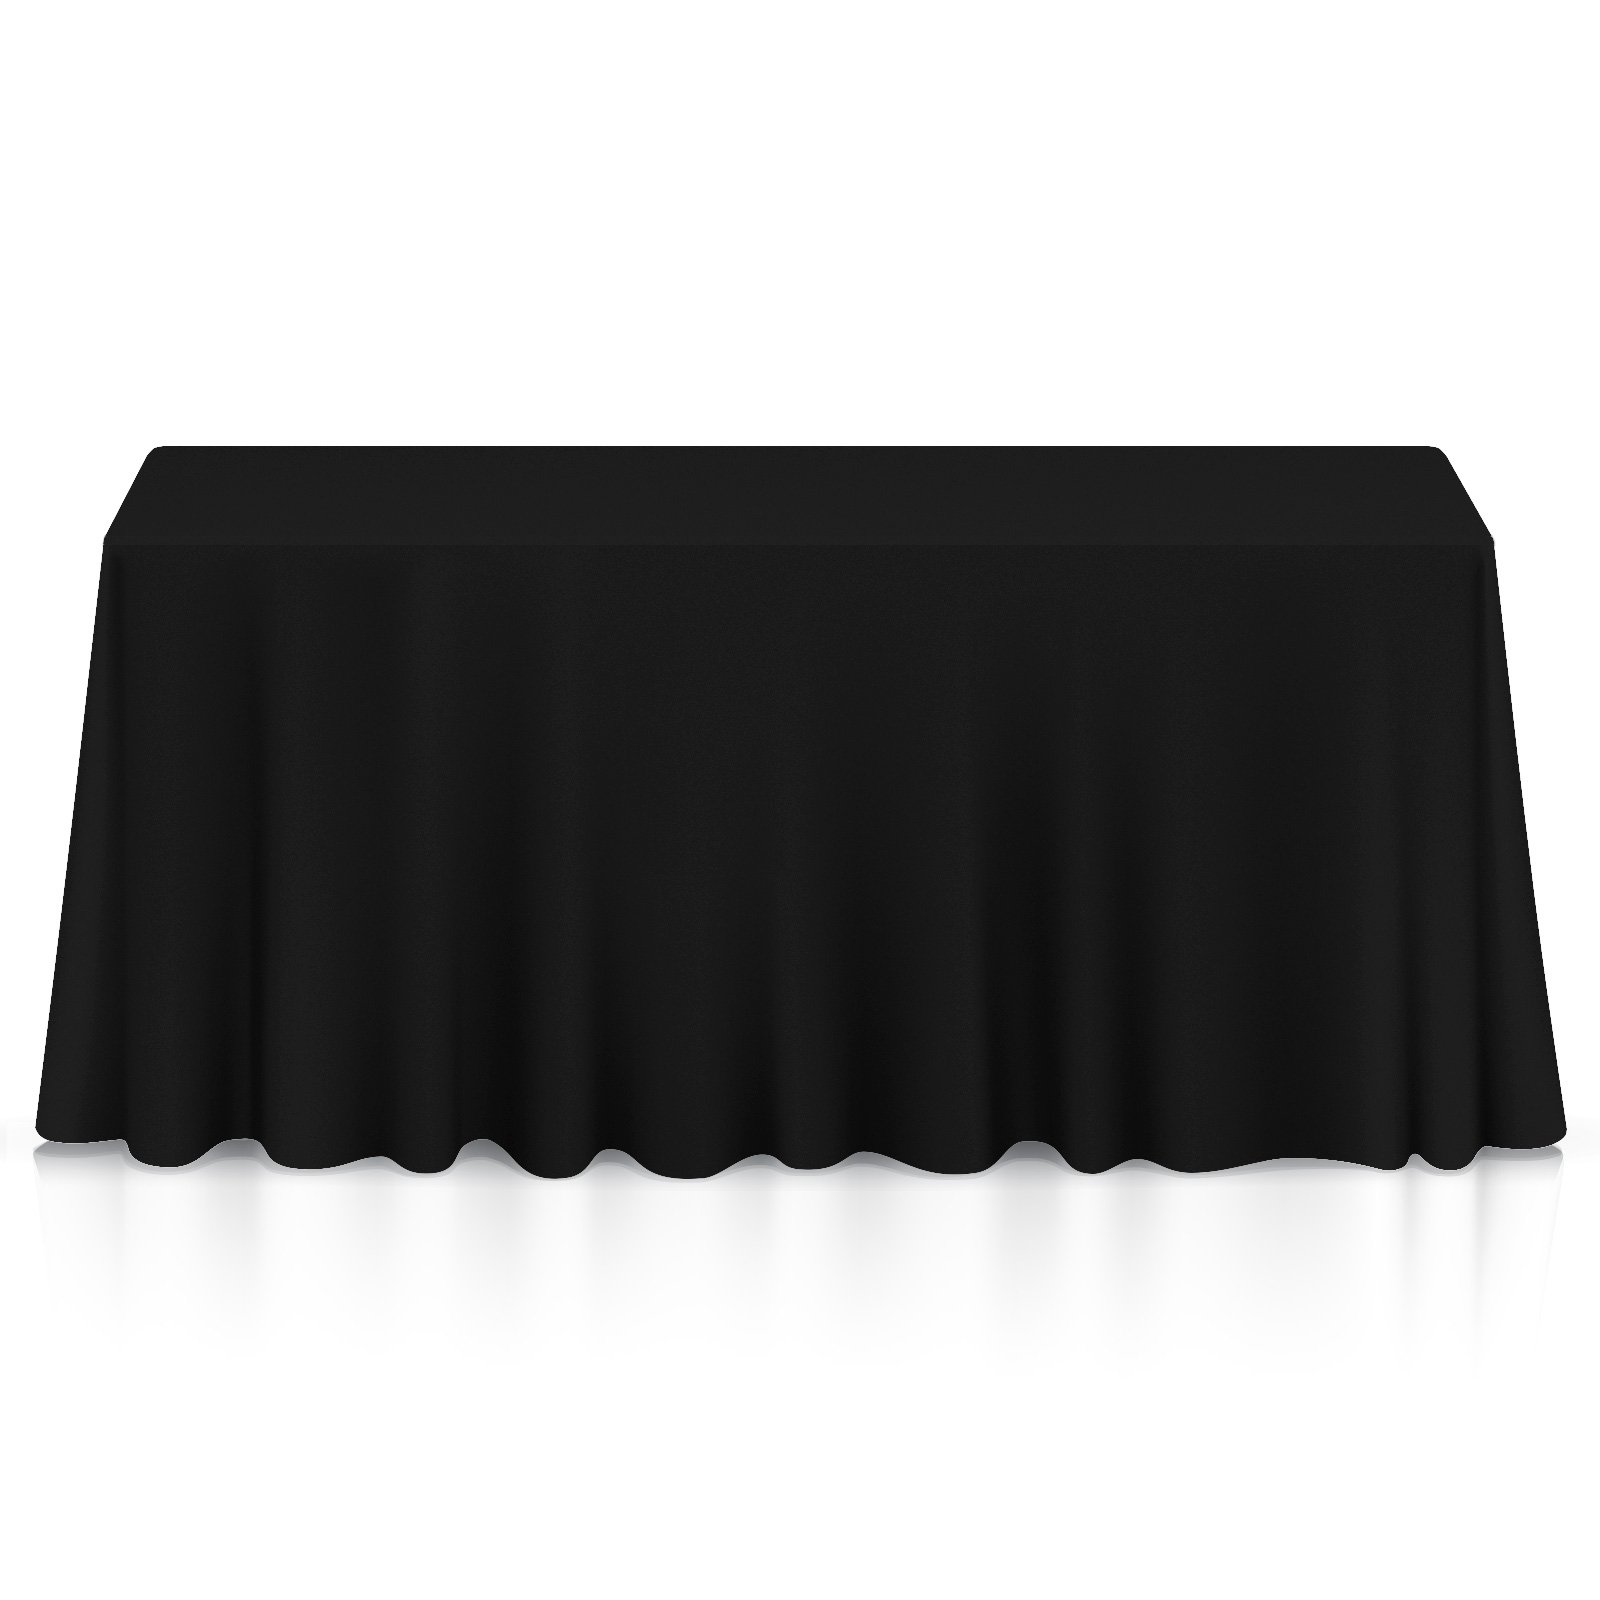 Lanns Linens 20 Premium 60'' x 102'' Tablecloths for Wedding/Banquet/Restaurant - Rectangular Polyester Fabric Table Cloths - Black